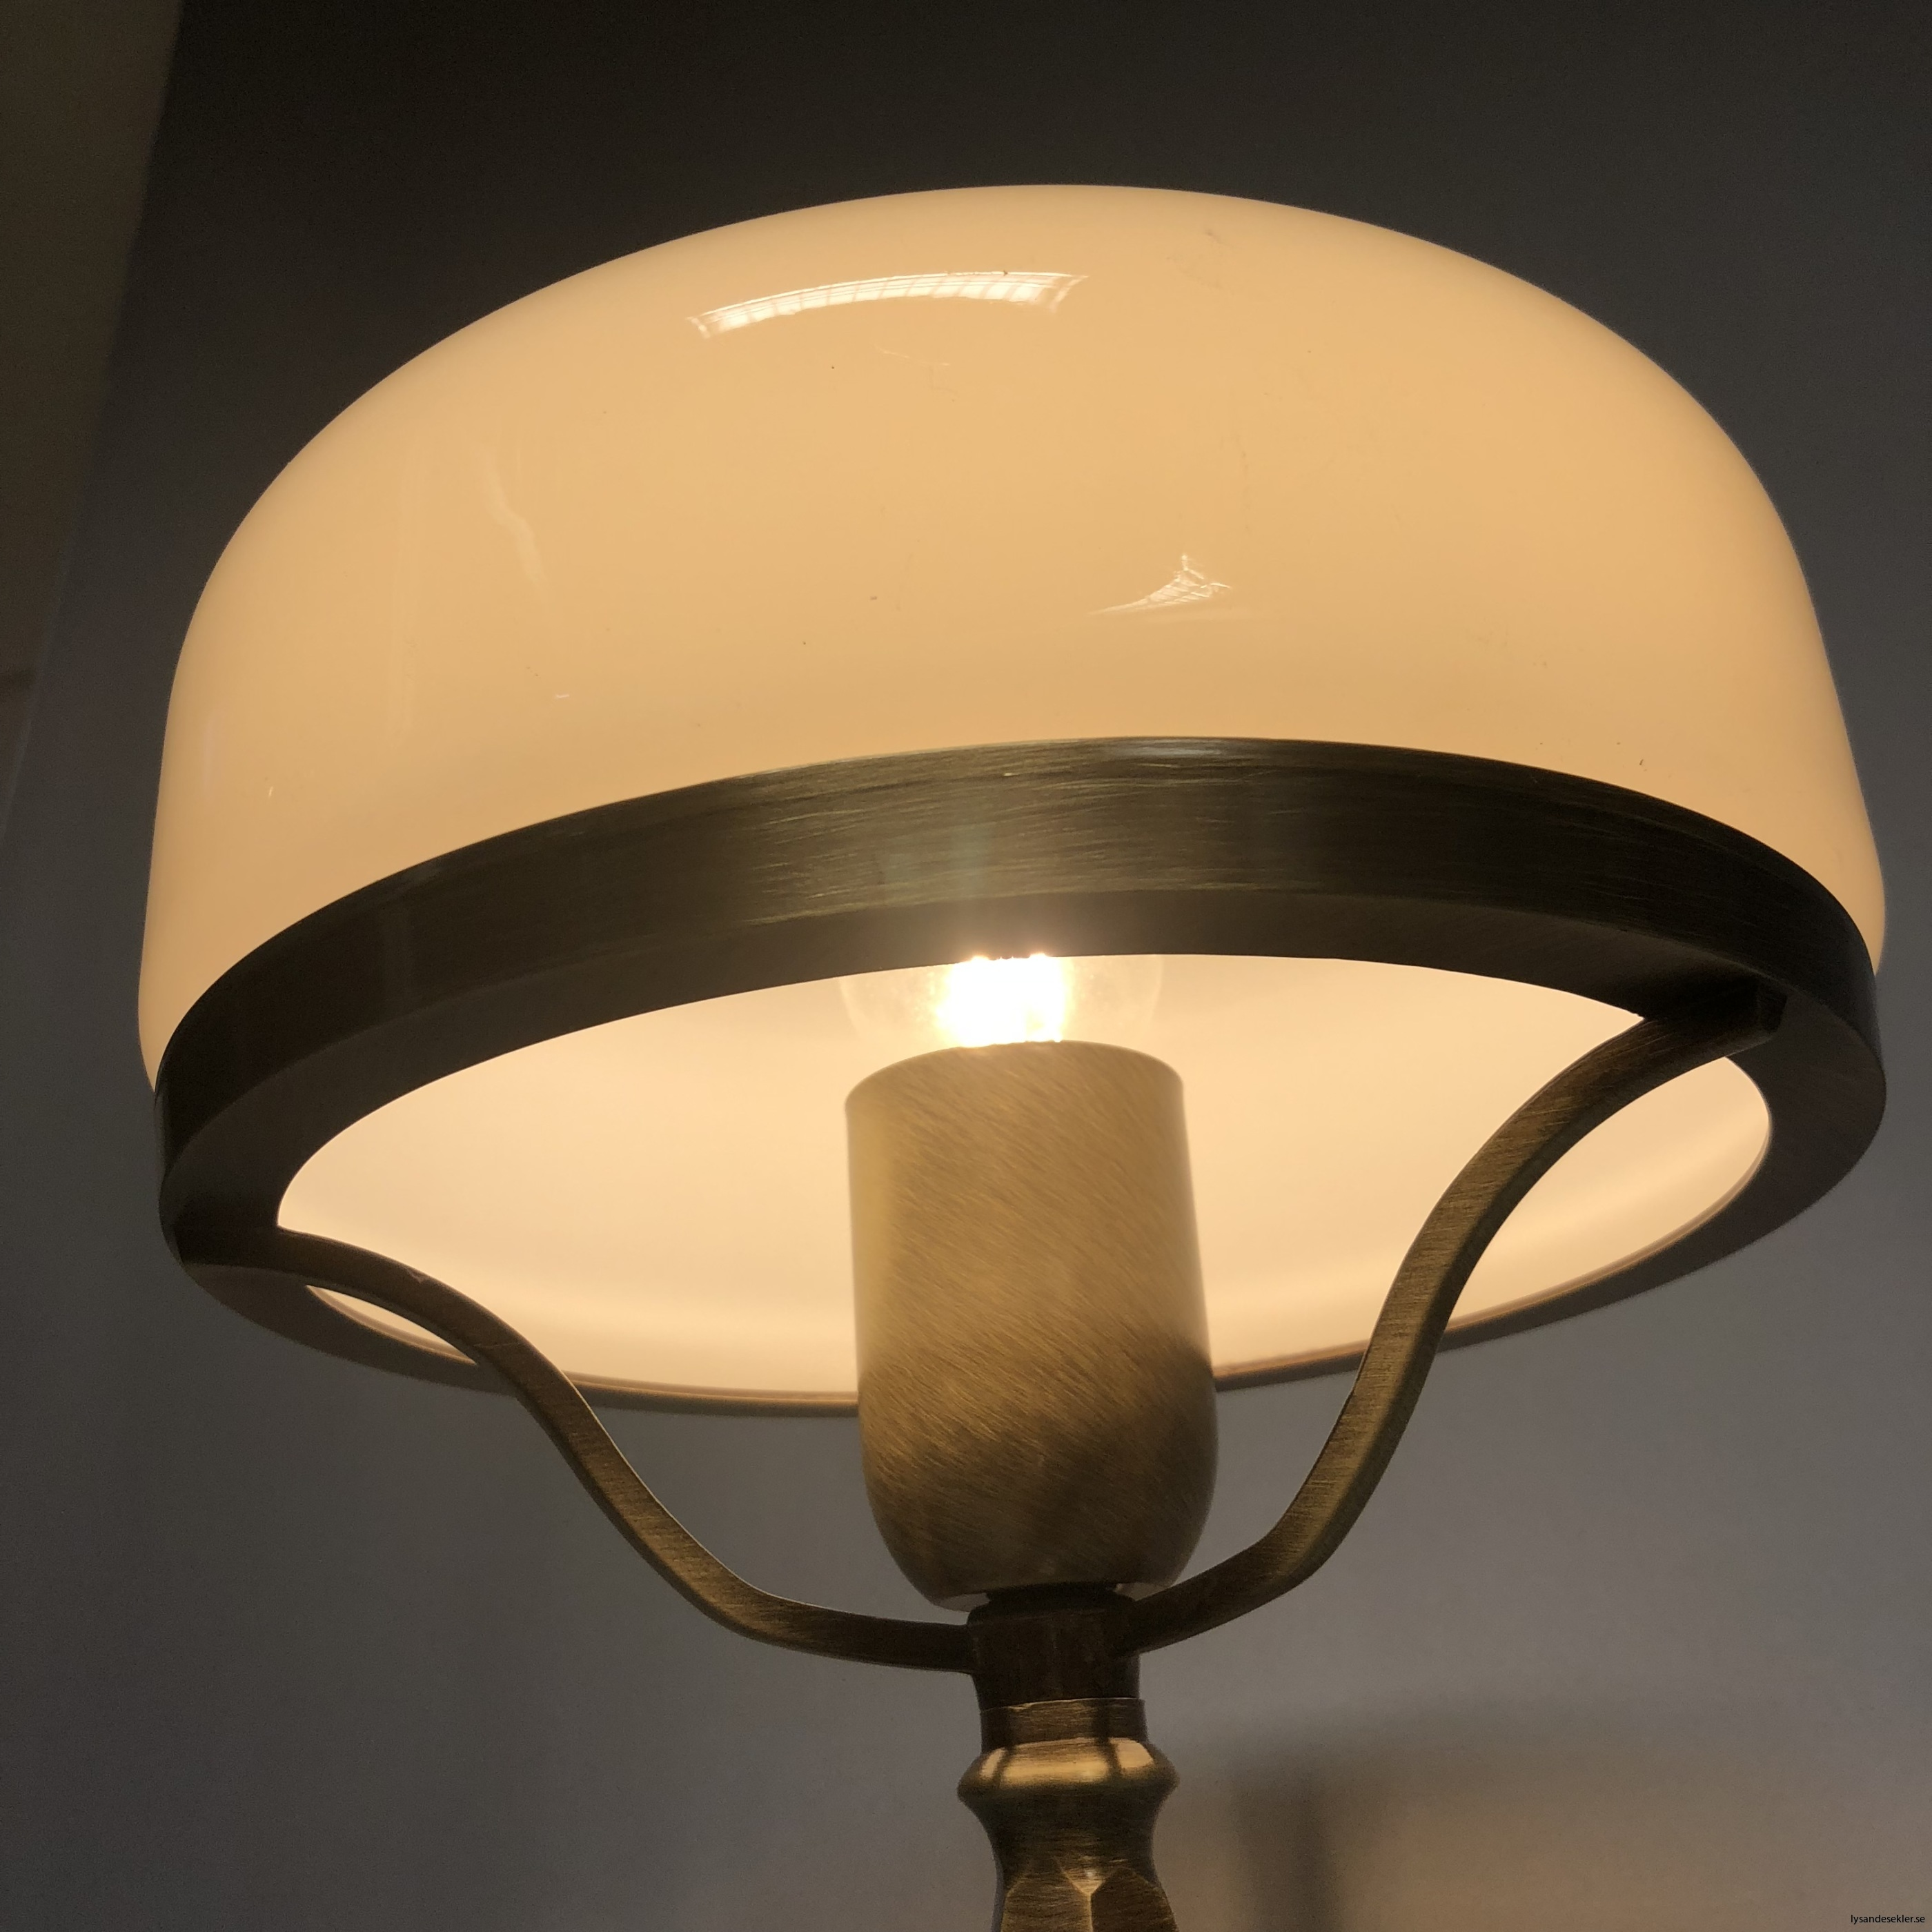 strindbergslampa strindbergslampor strindberg lampa skärm kupa strindbergsskärm strindbergskupa50